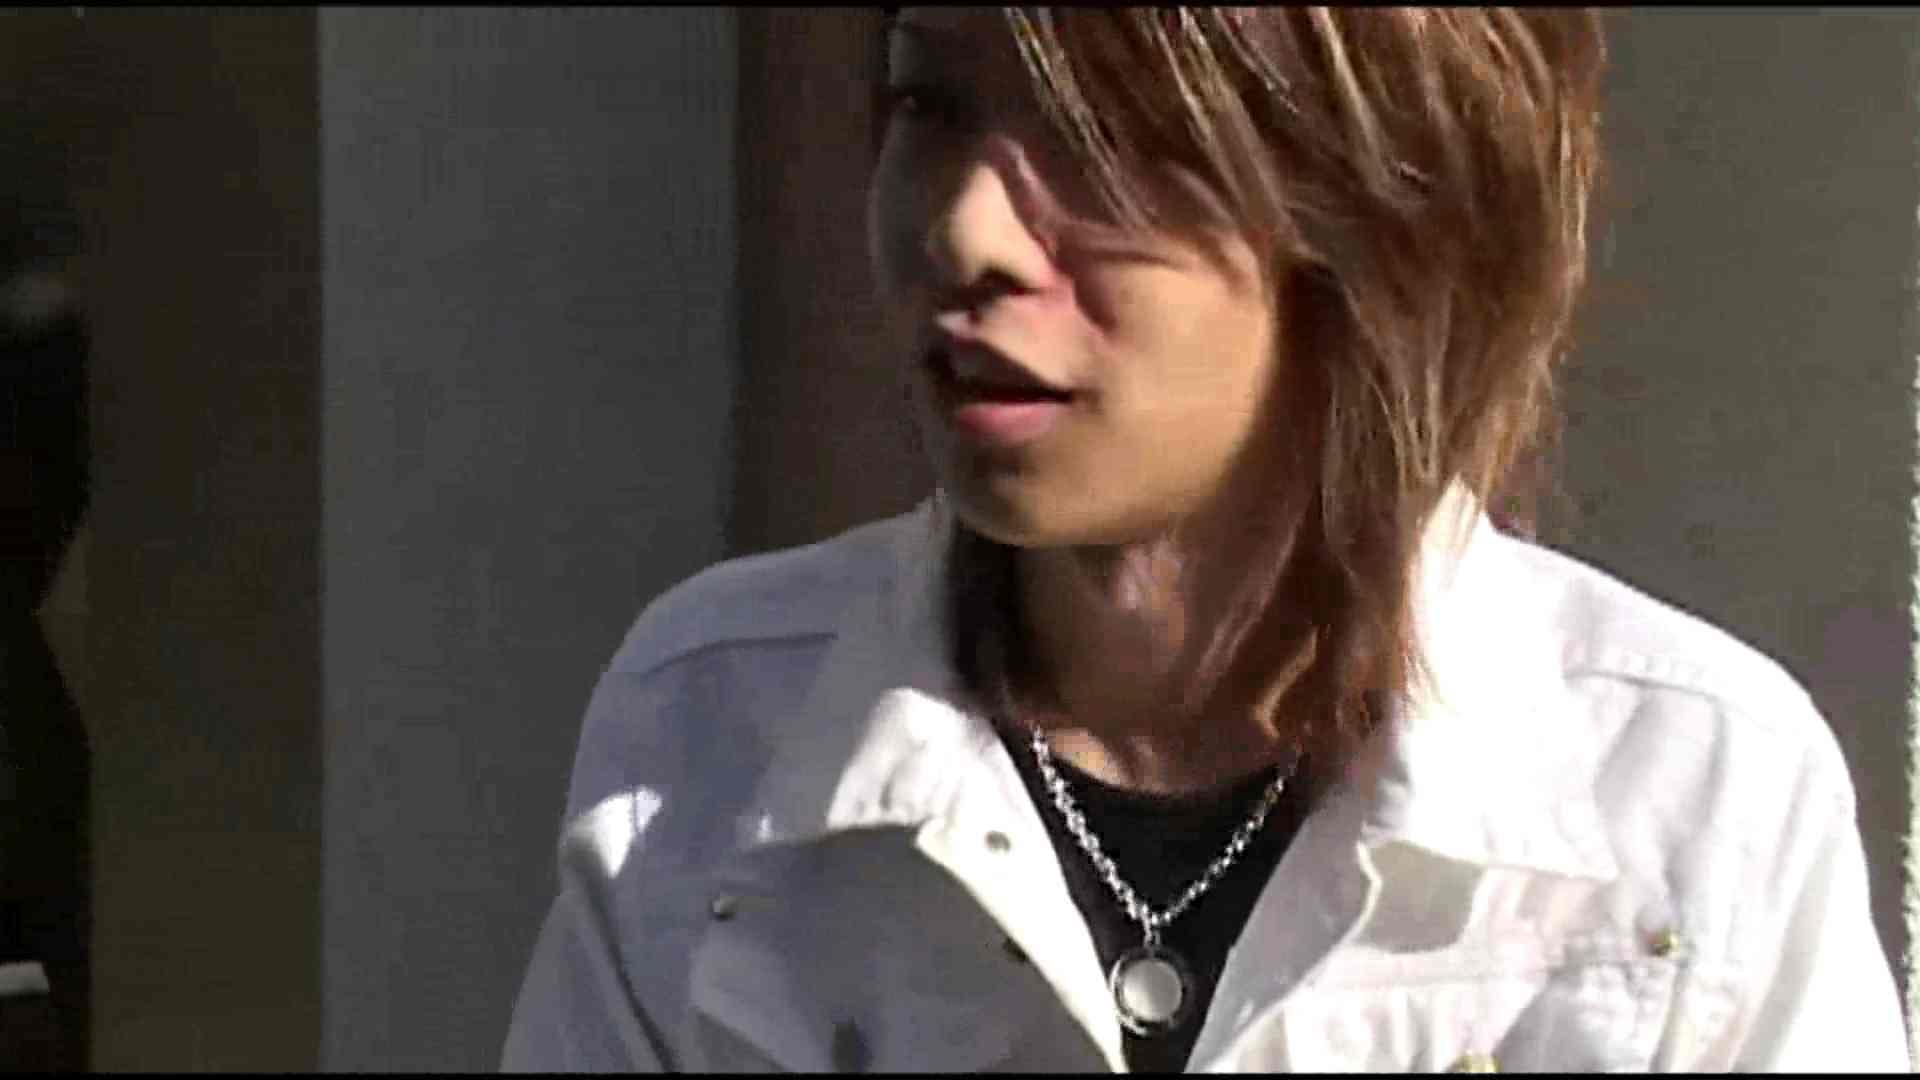 (HDバージョン)俺、チャラ男じゃないっす。違うっす...。VOL.03 完全無修正版 ゲイ精子画像 67枚 2